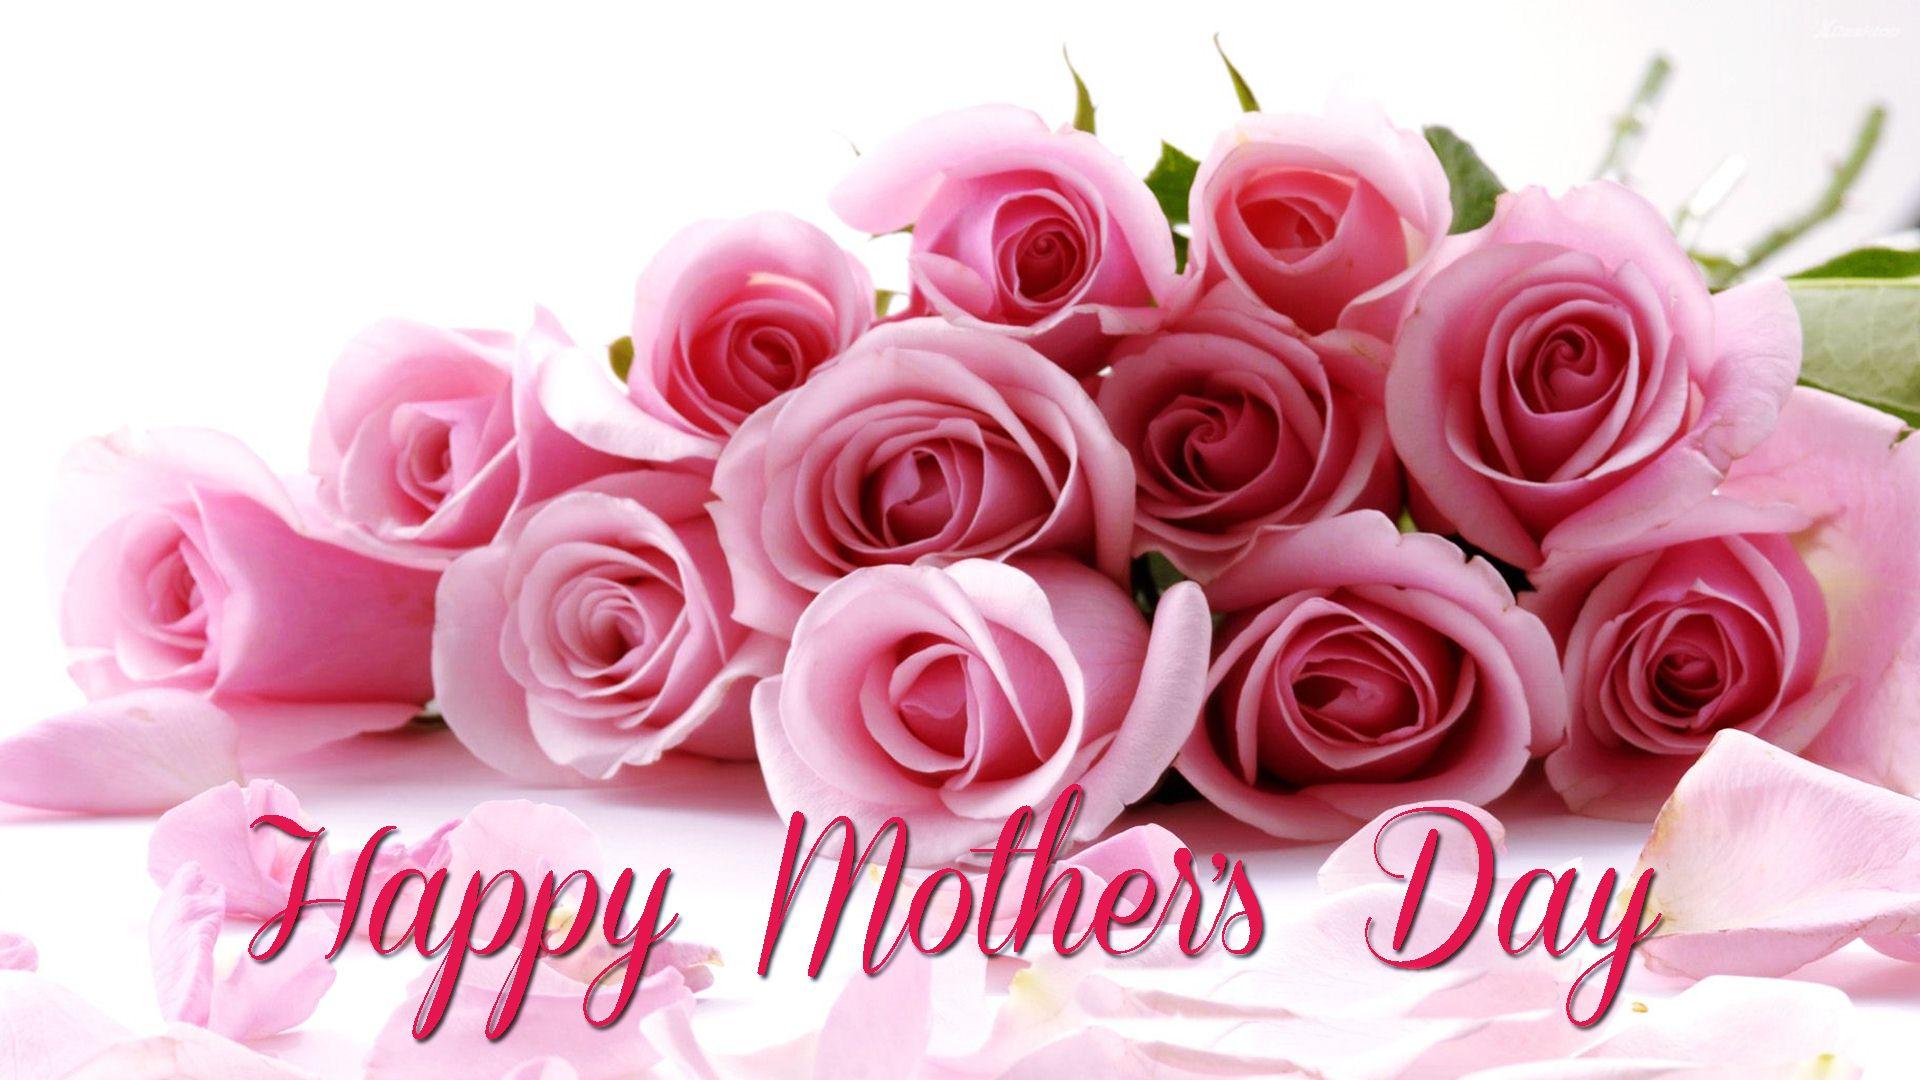 mothersdayroses.jpg